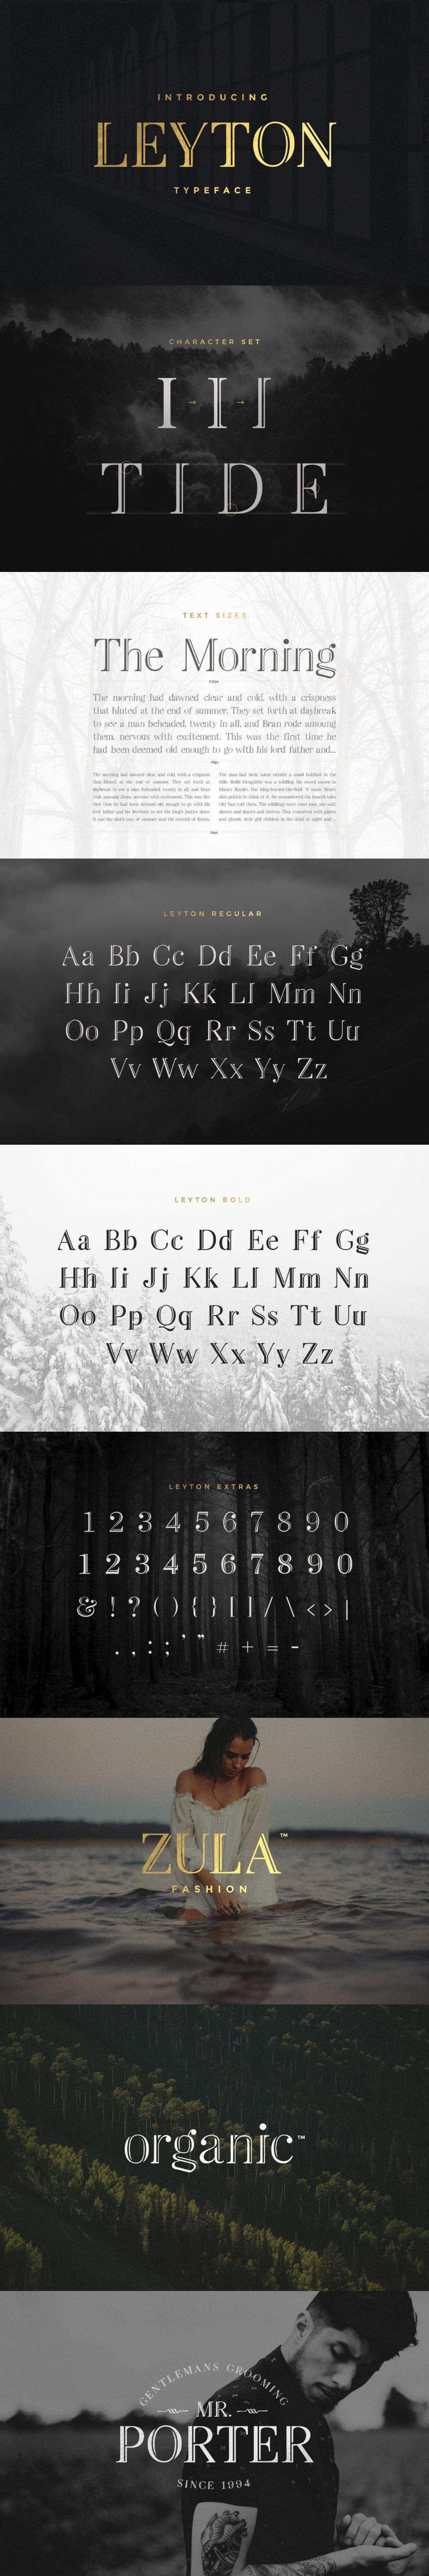 Leyton font